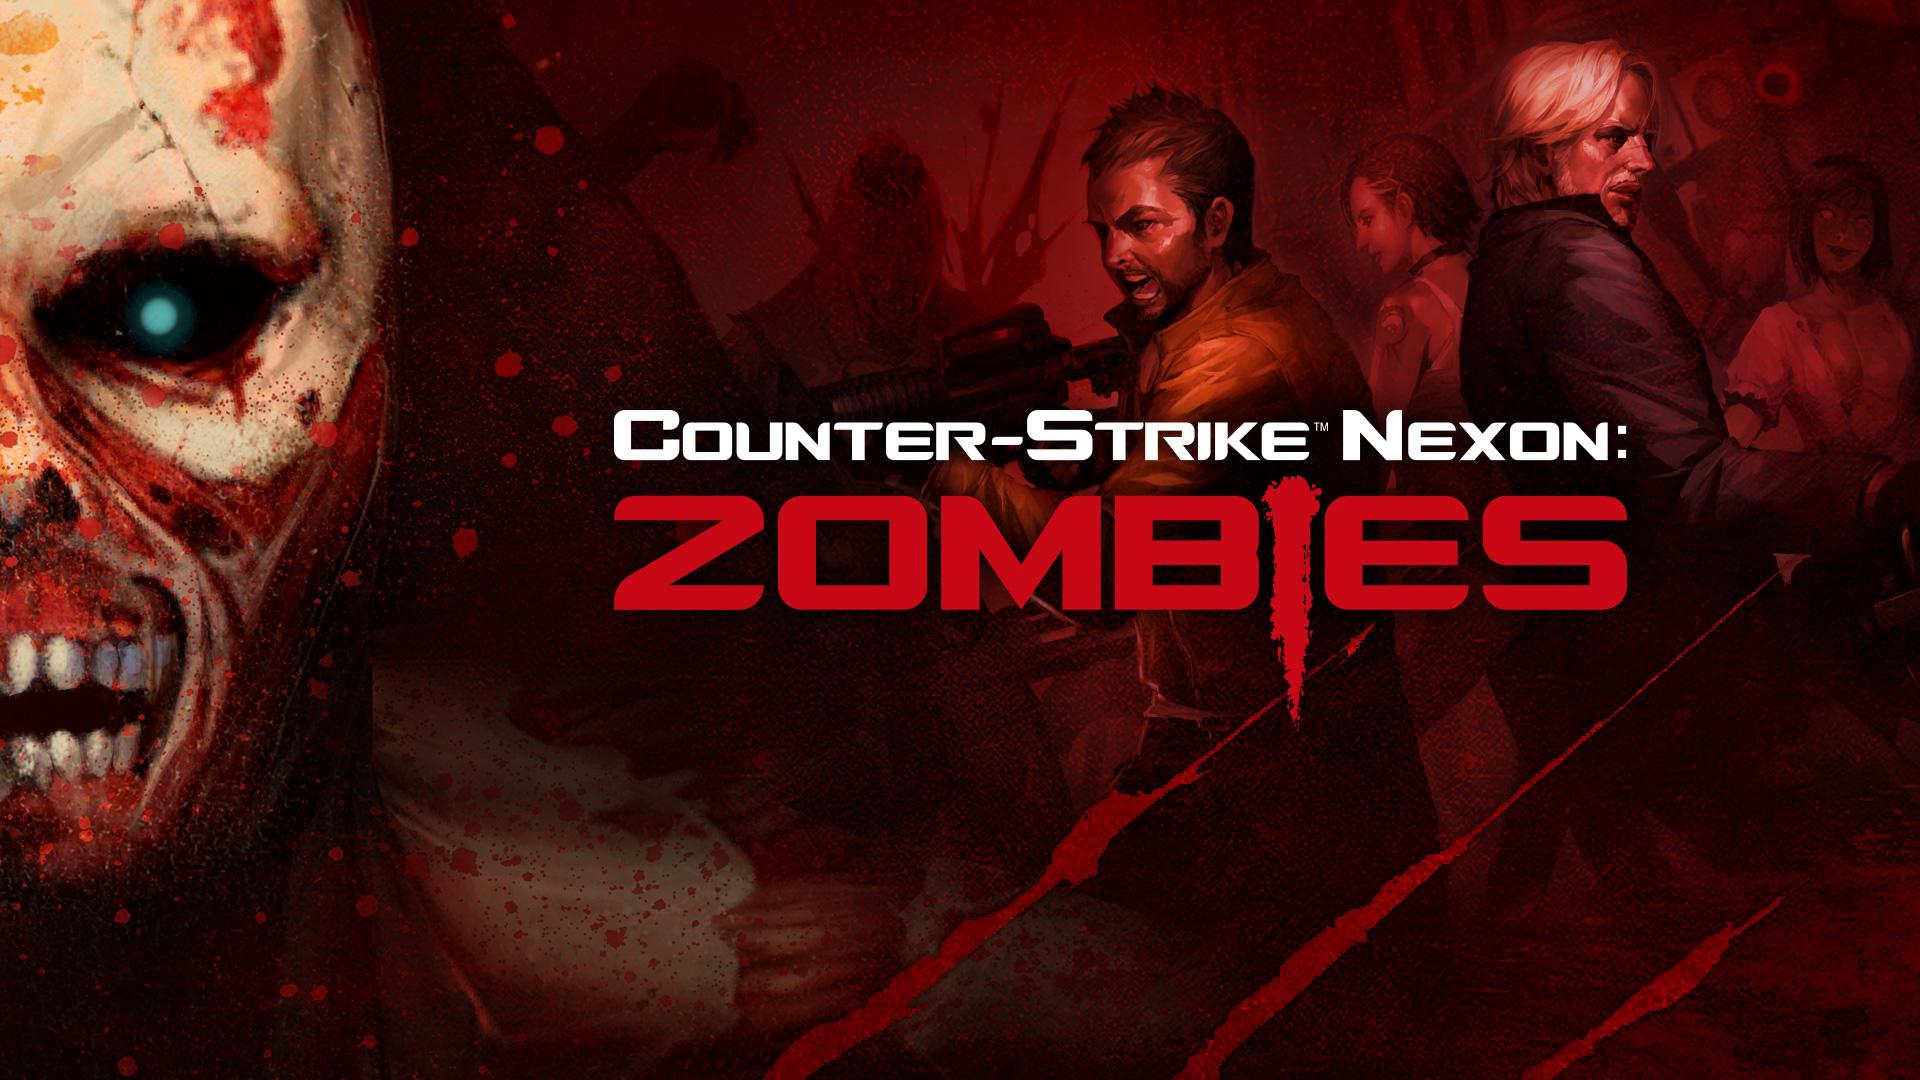 Counterstrike-nexon-zombies-2